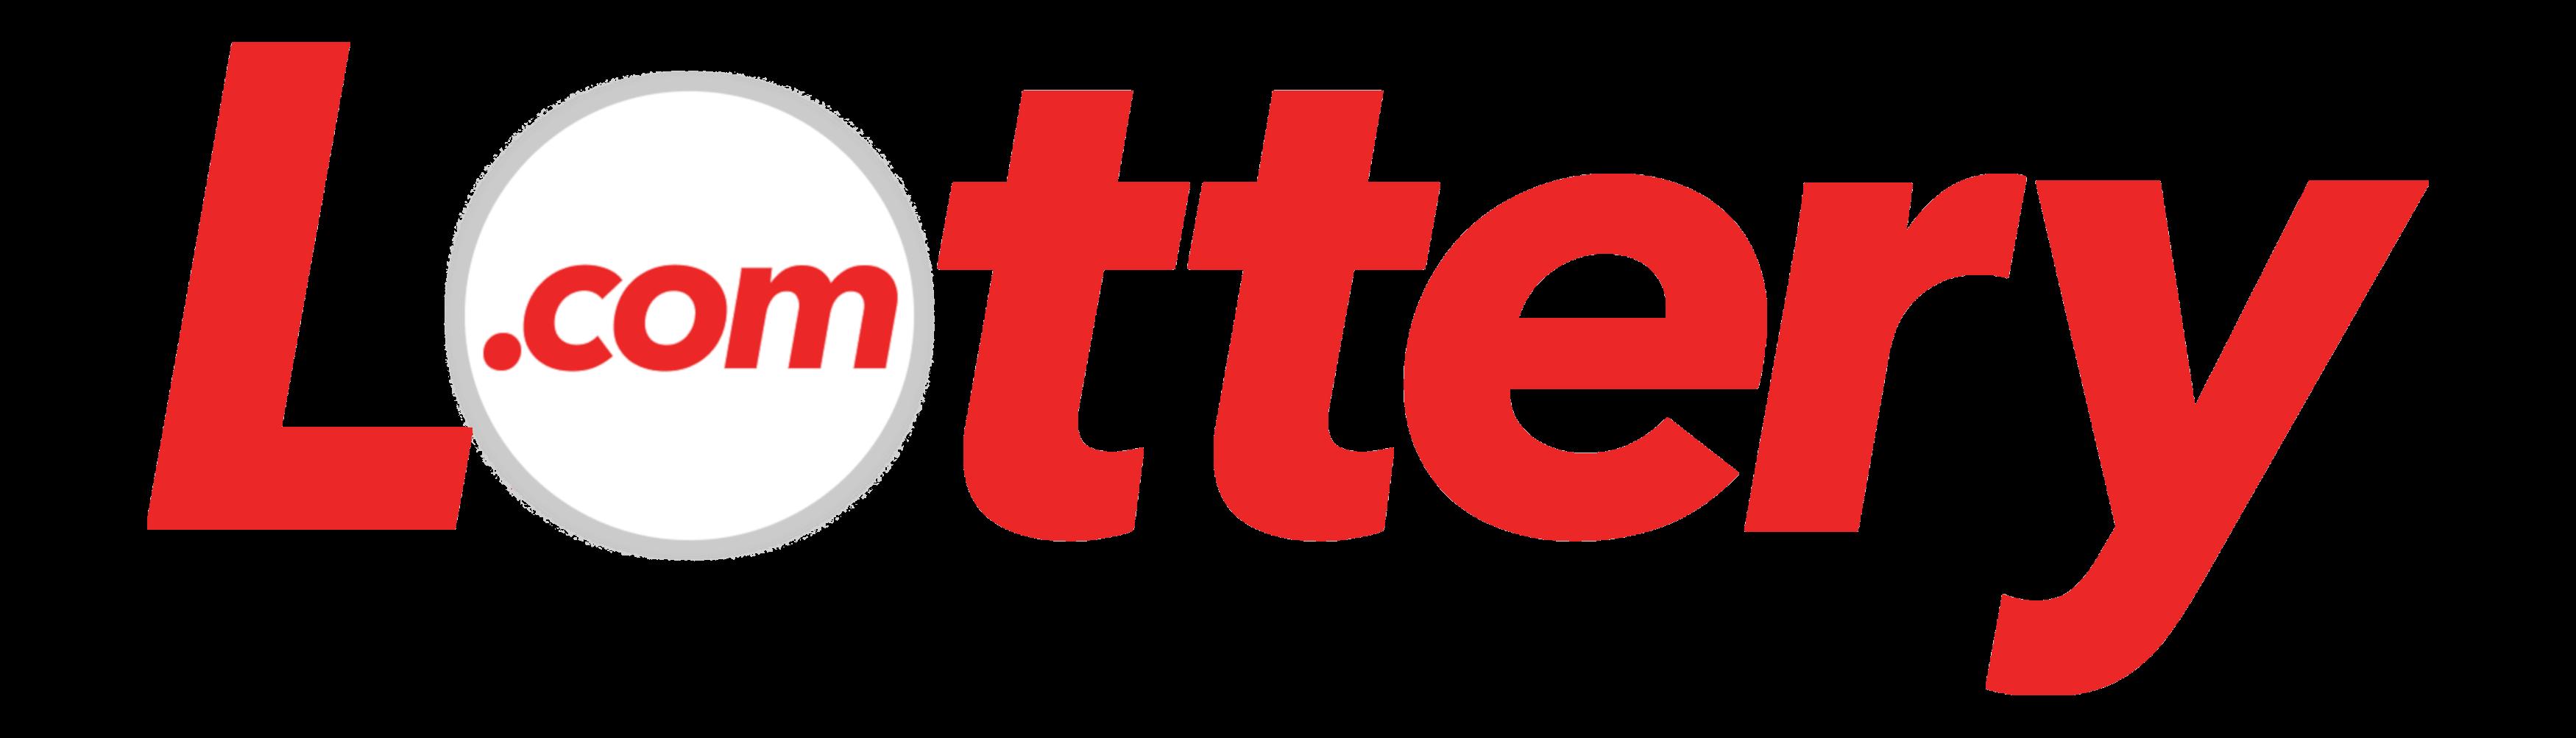 Lottery.com